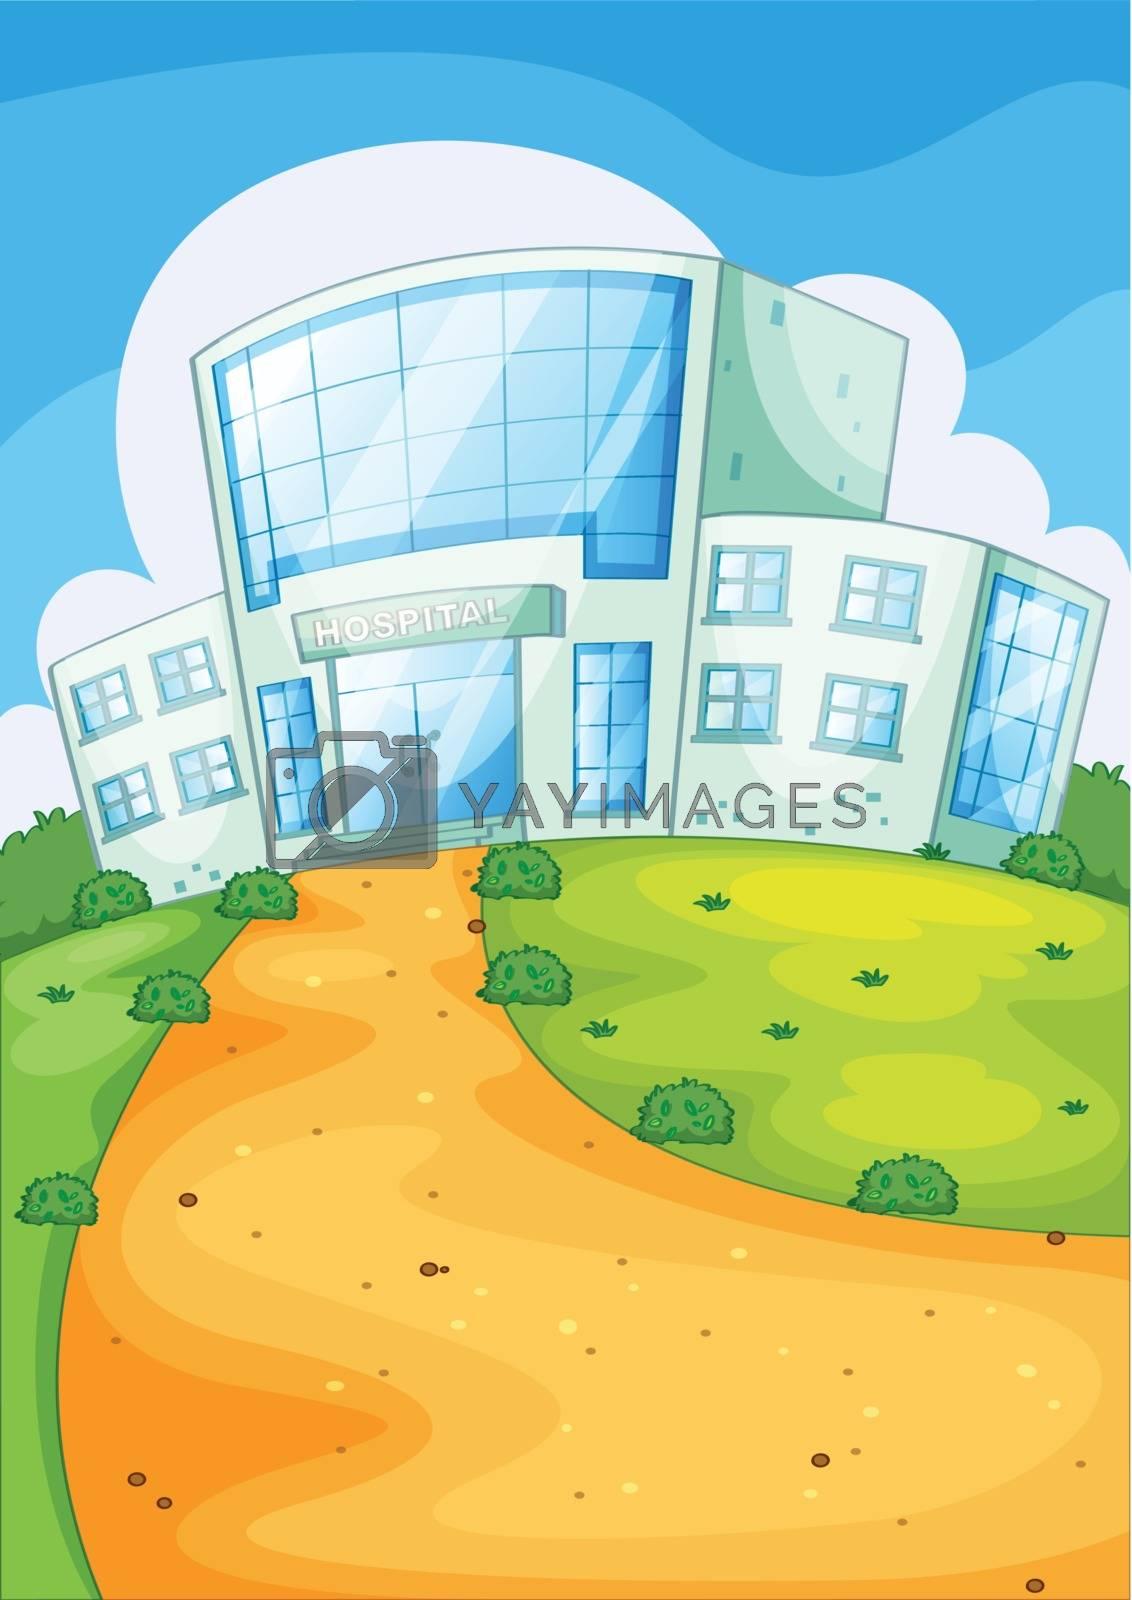 healthcare by iimages